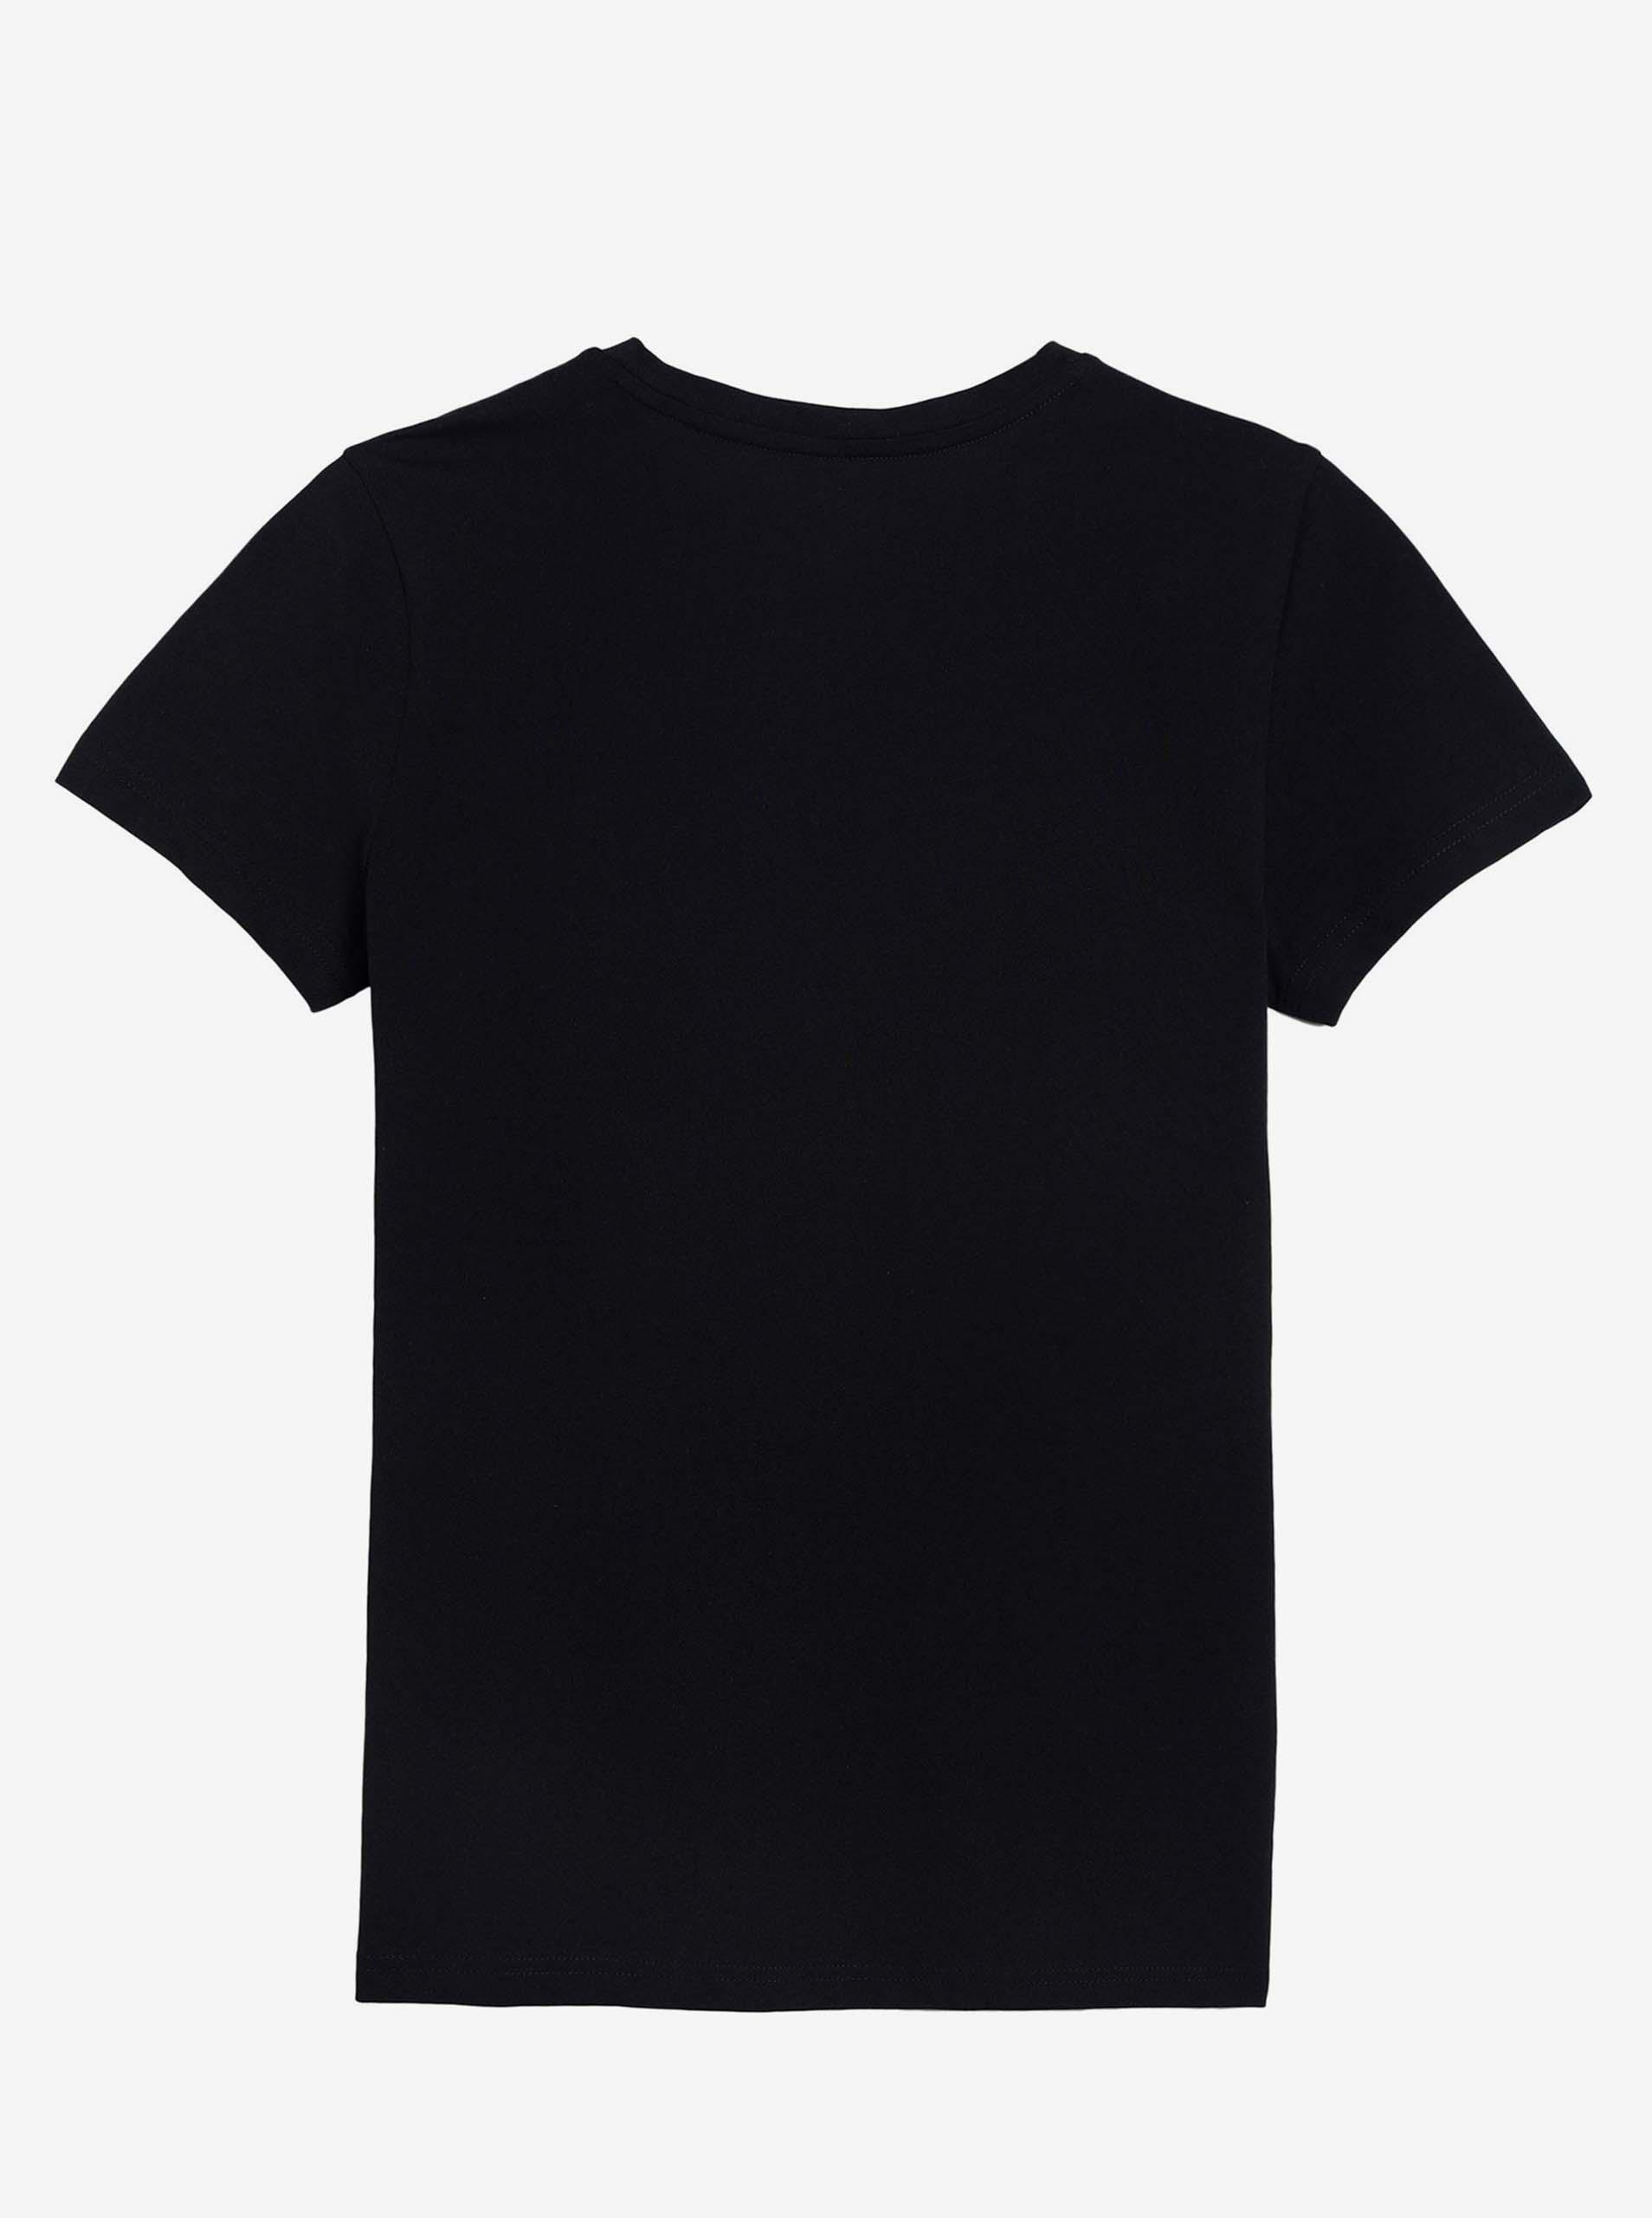 Puma Women's t-shirt black